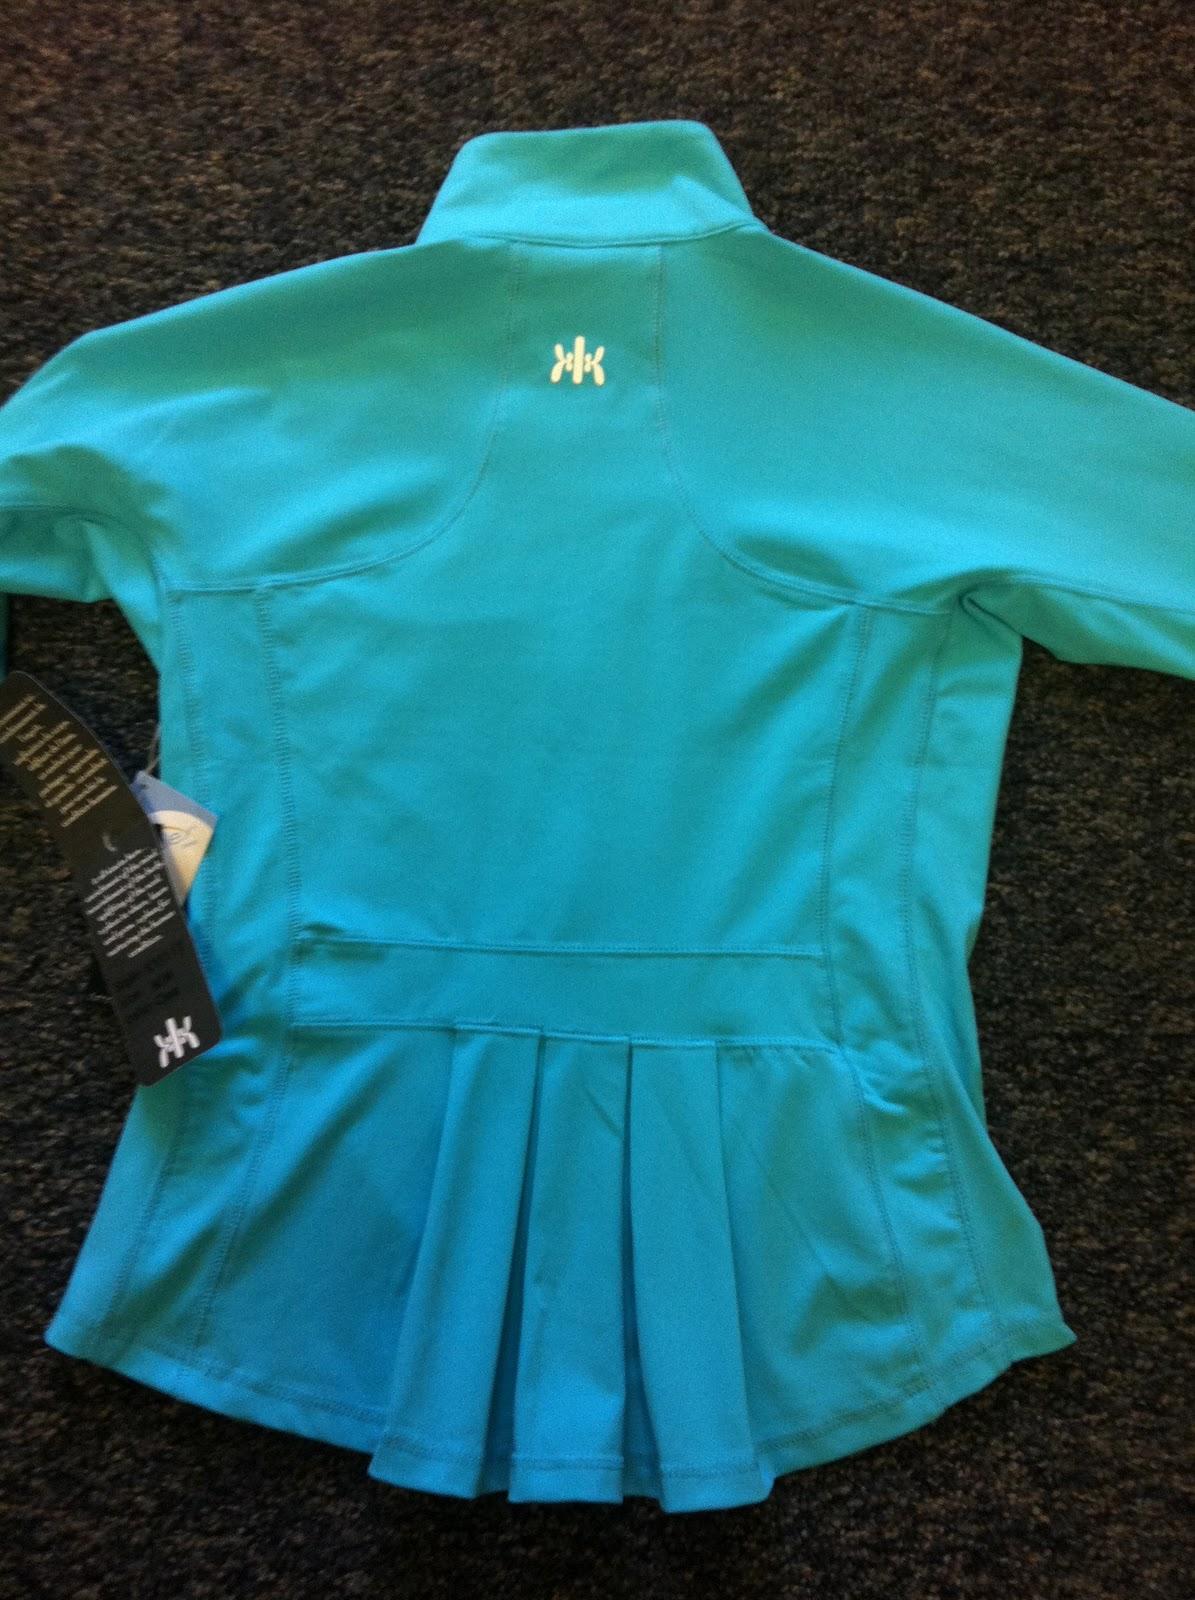 Style Athletics Teal Aqua Blue Kyodan Pleated JAcket